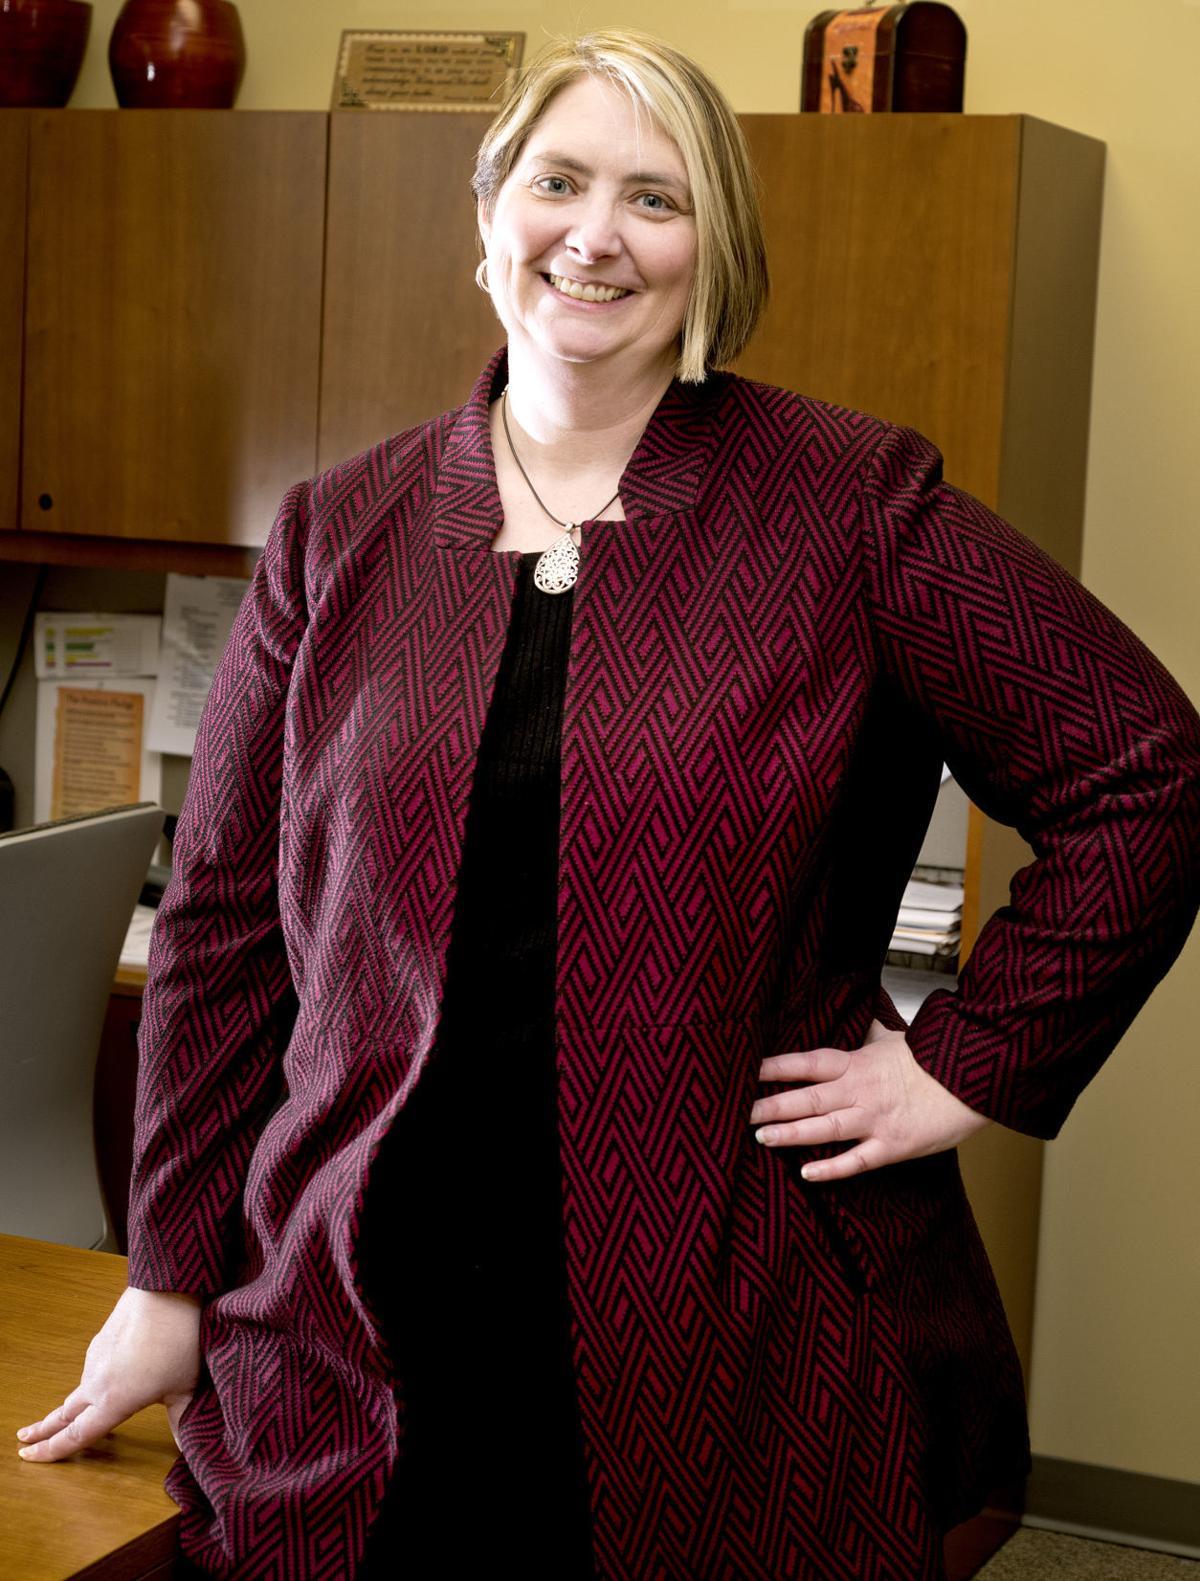 Cyndi Hanson 4th Congressional District candidate